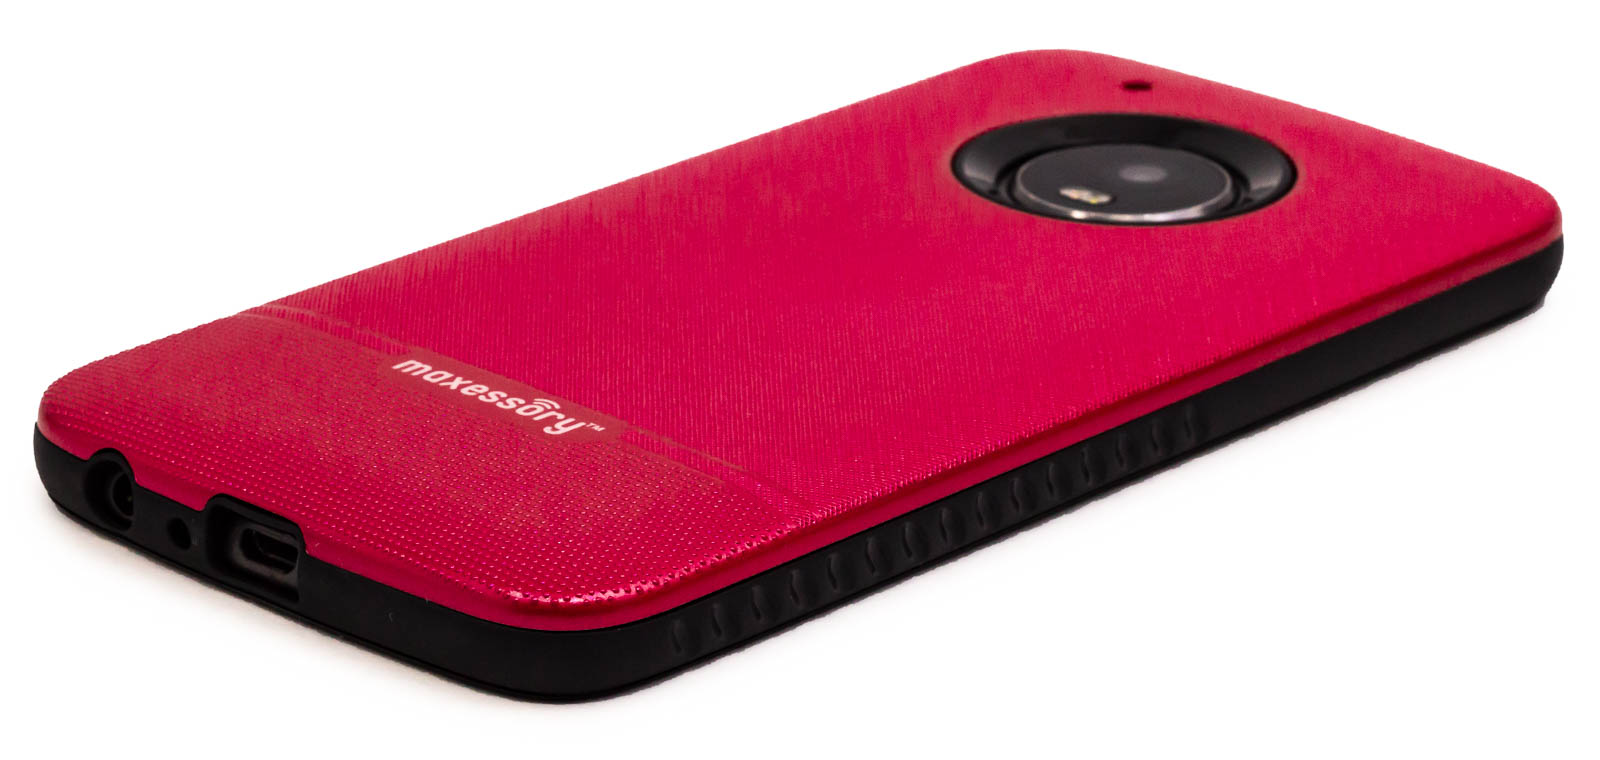 Moto-G5-Plus-Case-Moto-X-17-Case-Ultra-Thin-Hard-Body-Tactile-Shell-Cover thumbnail 35